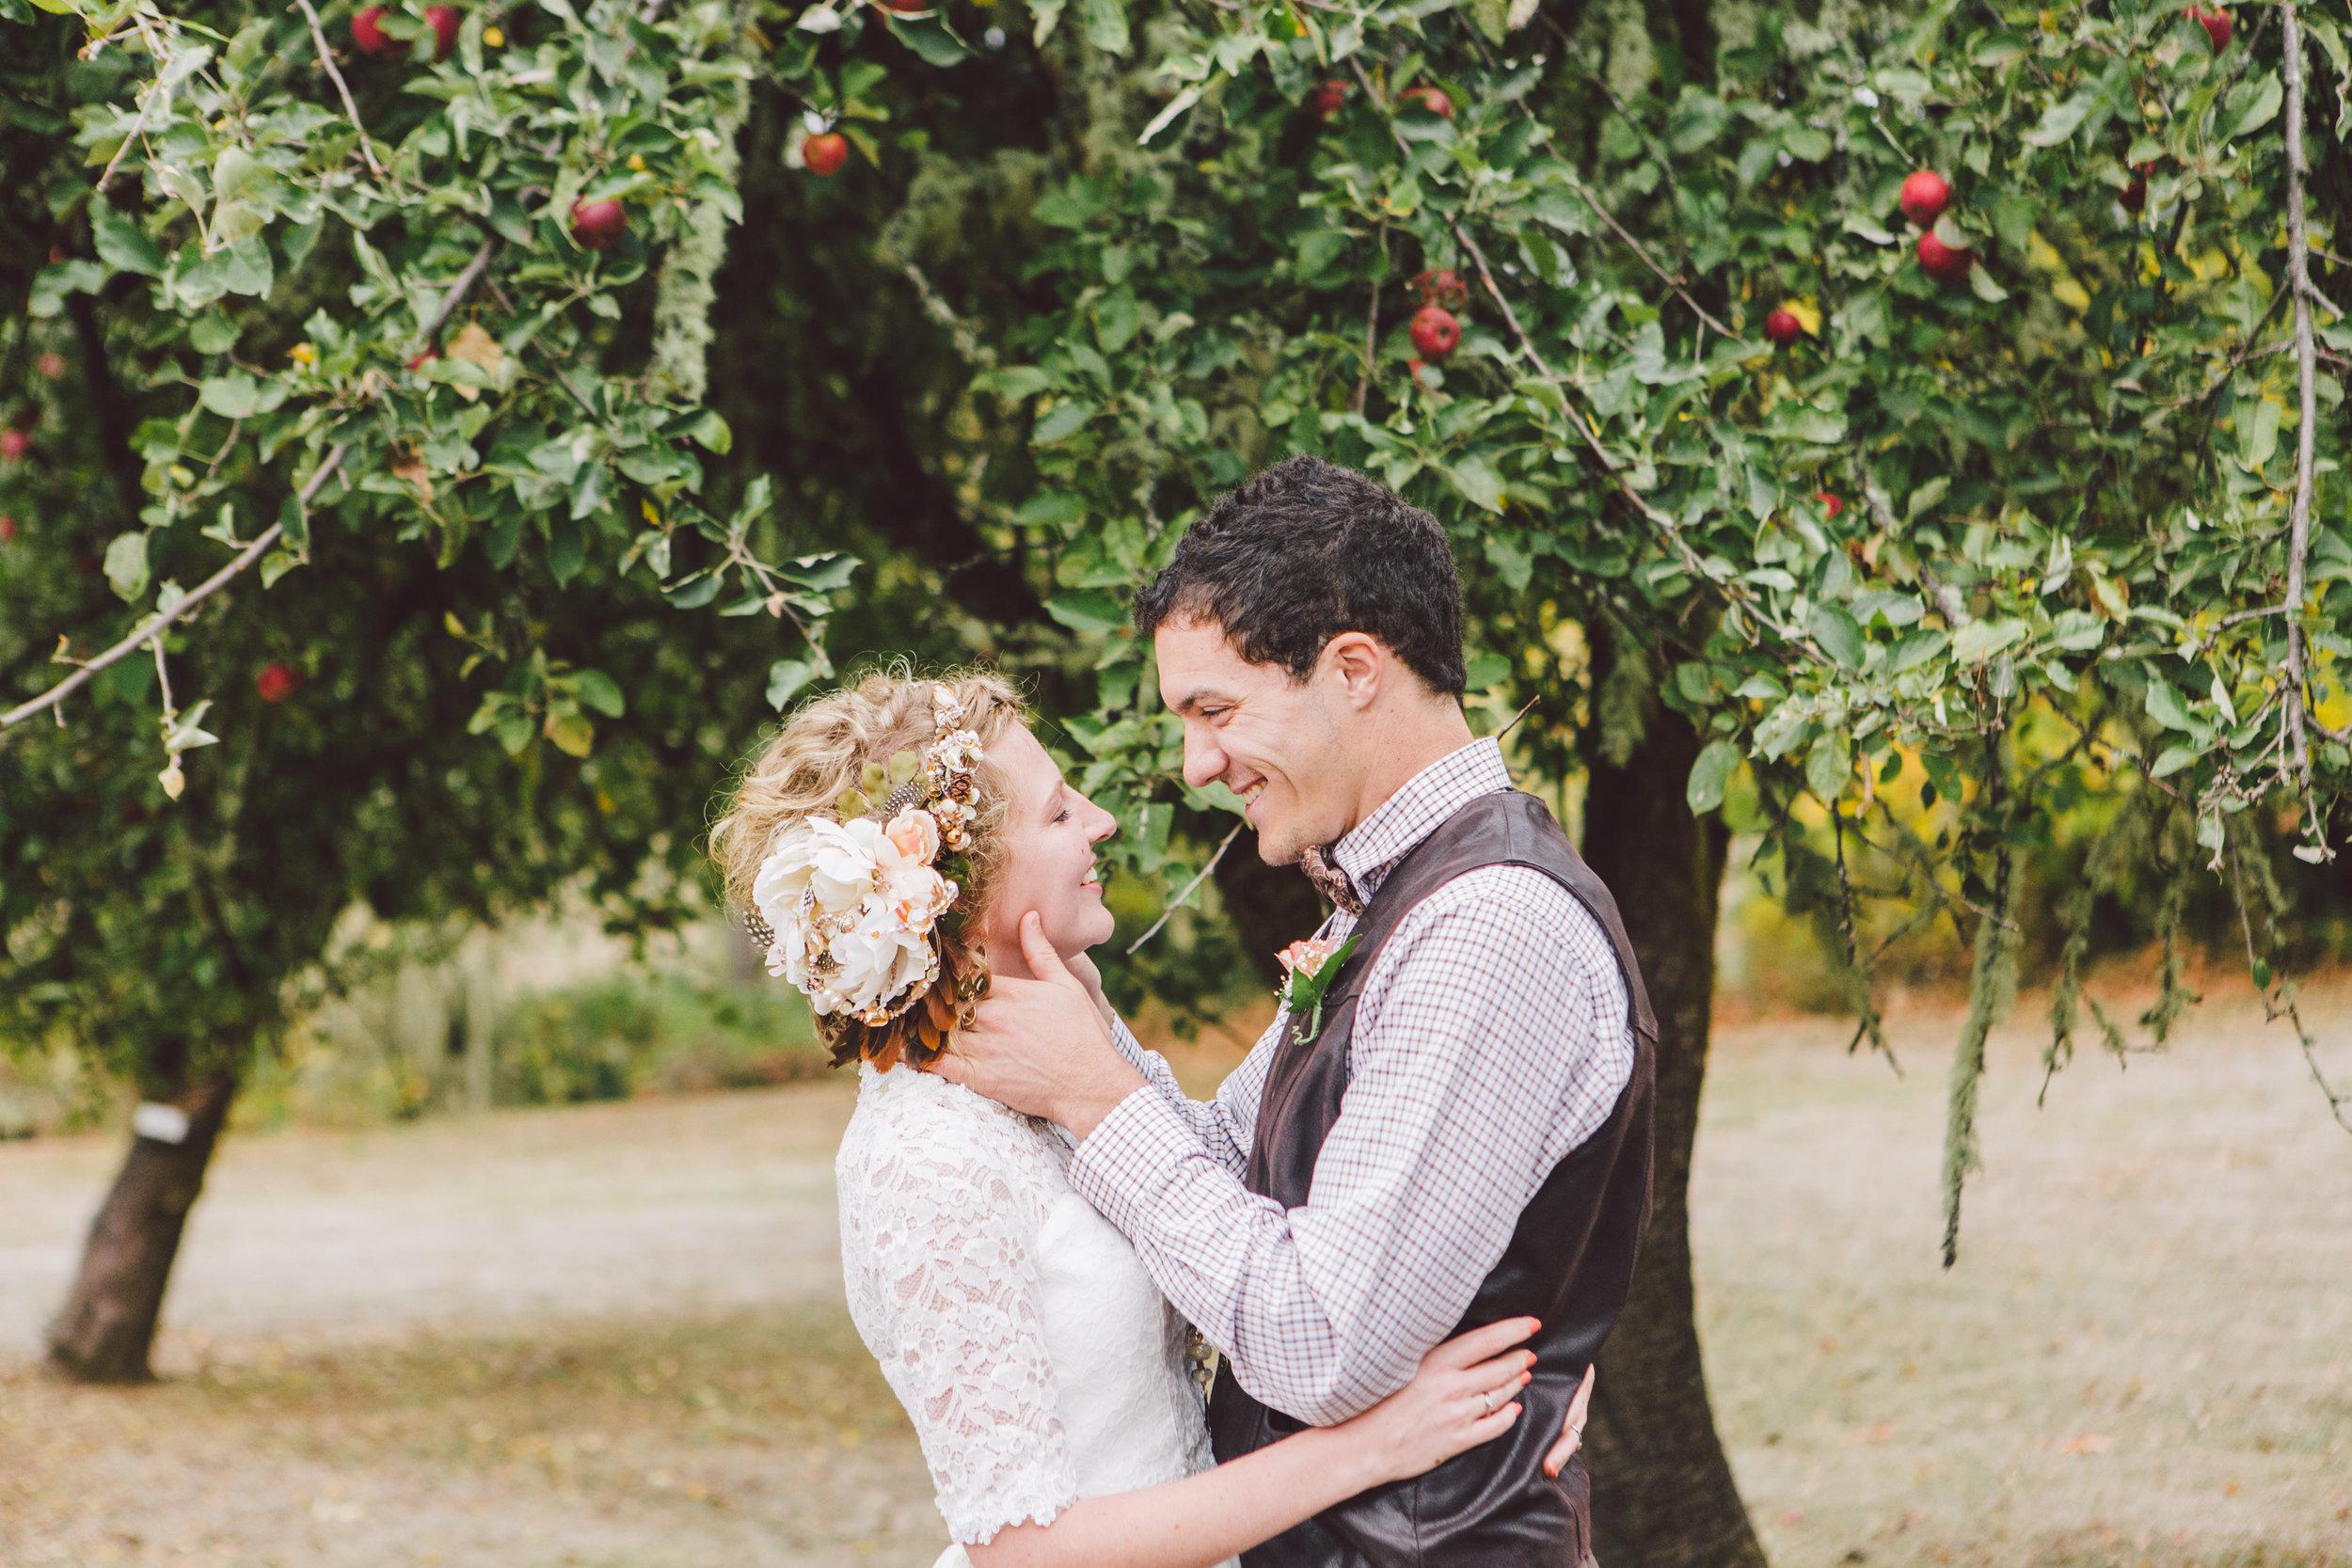 Luke & Brenna October 2015 (164).jpg